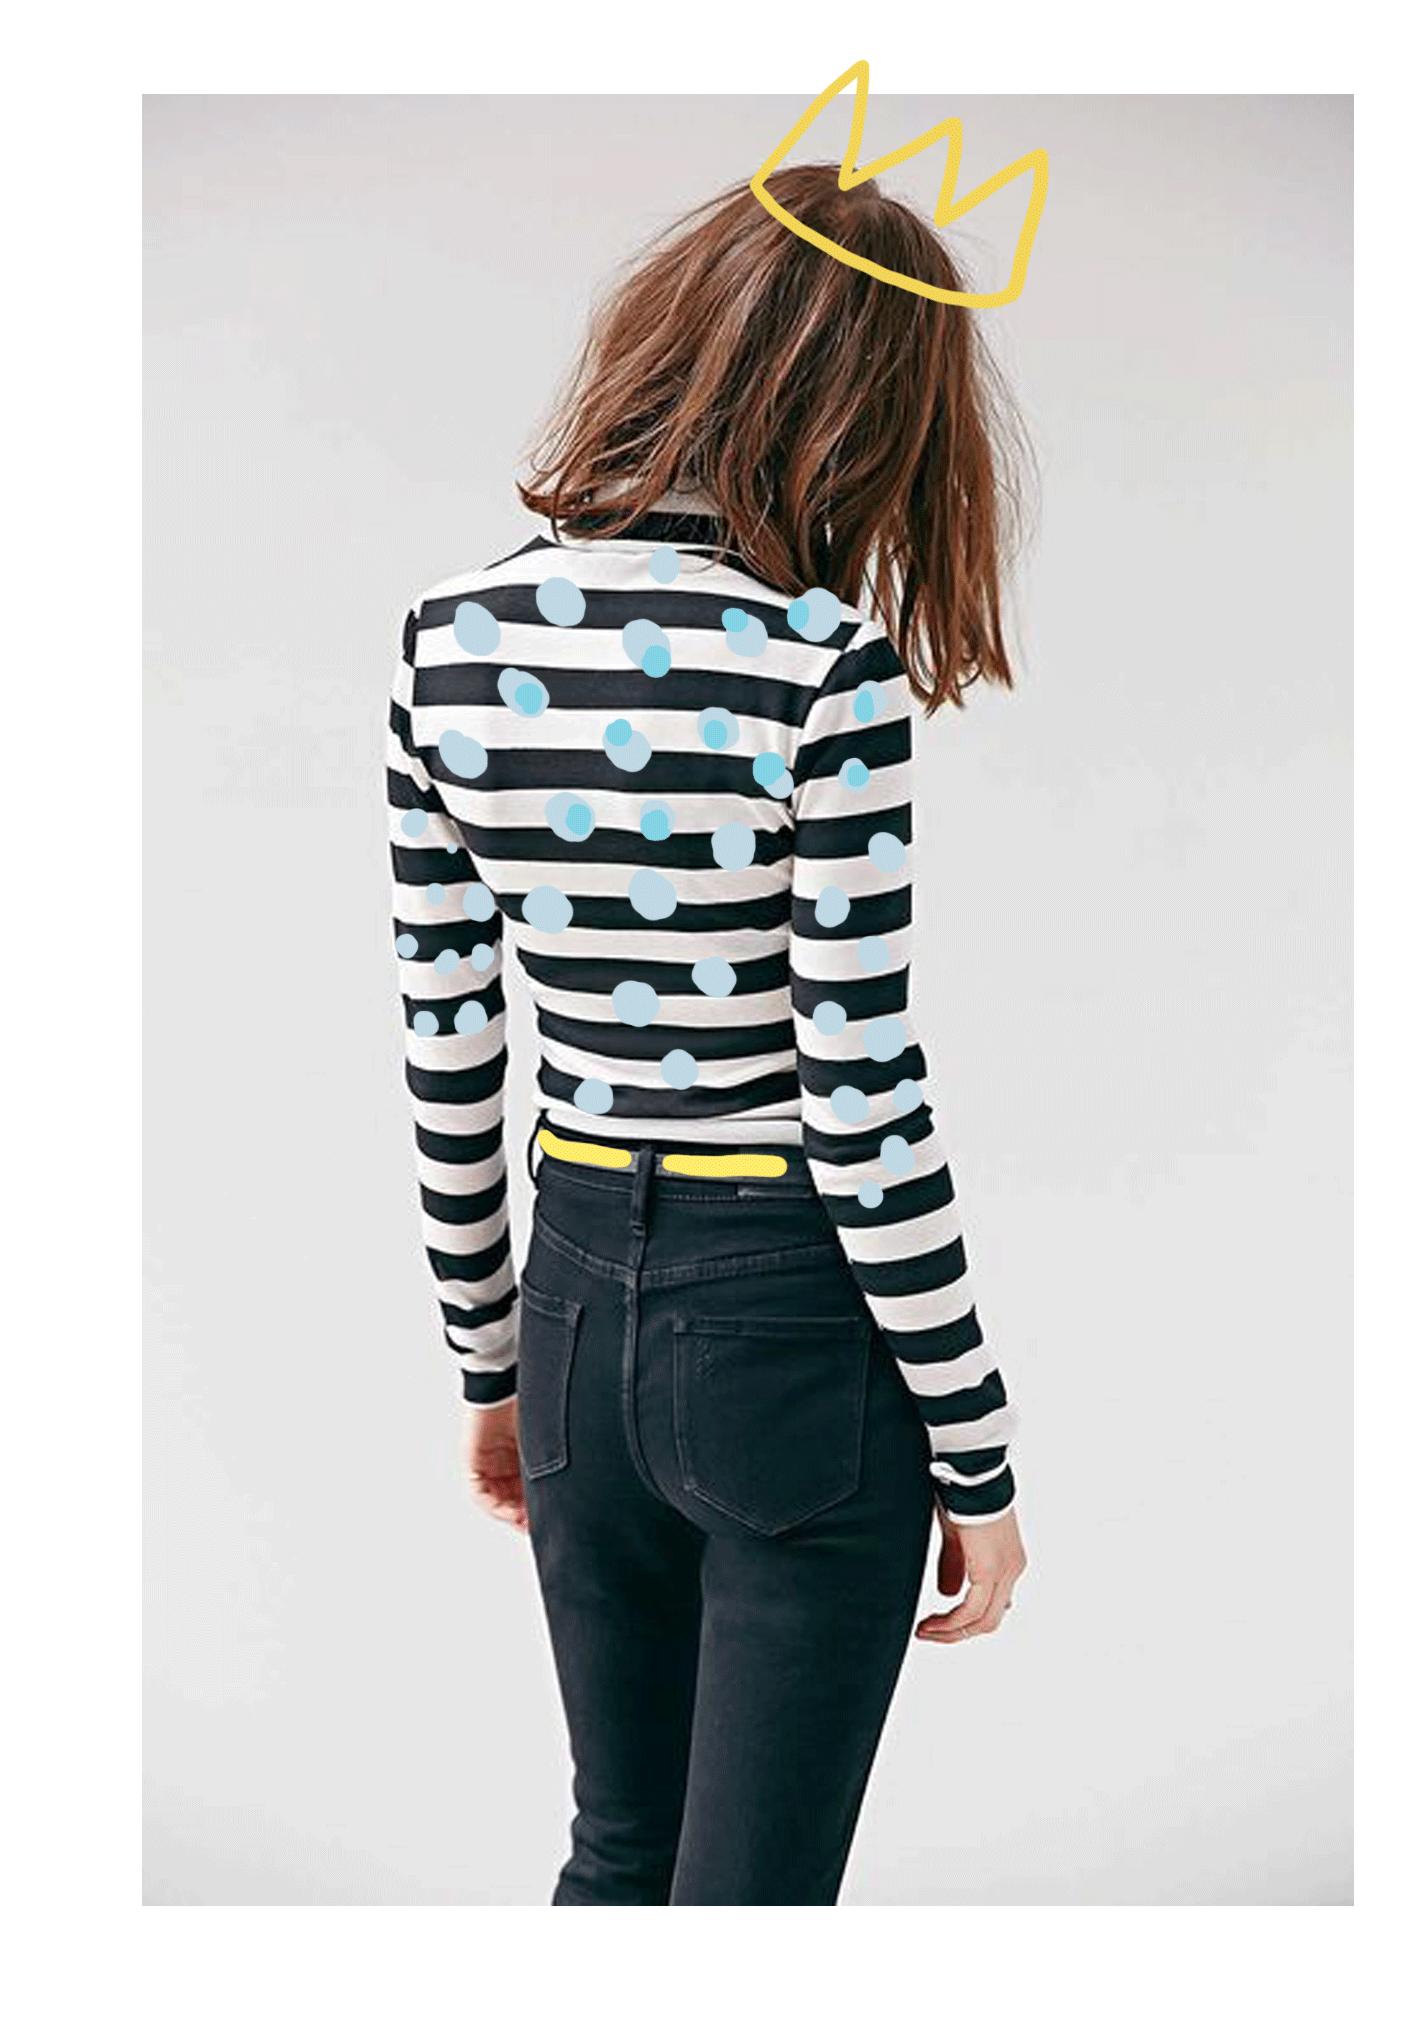 stripes and polka dots | @themissprints